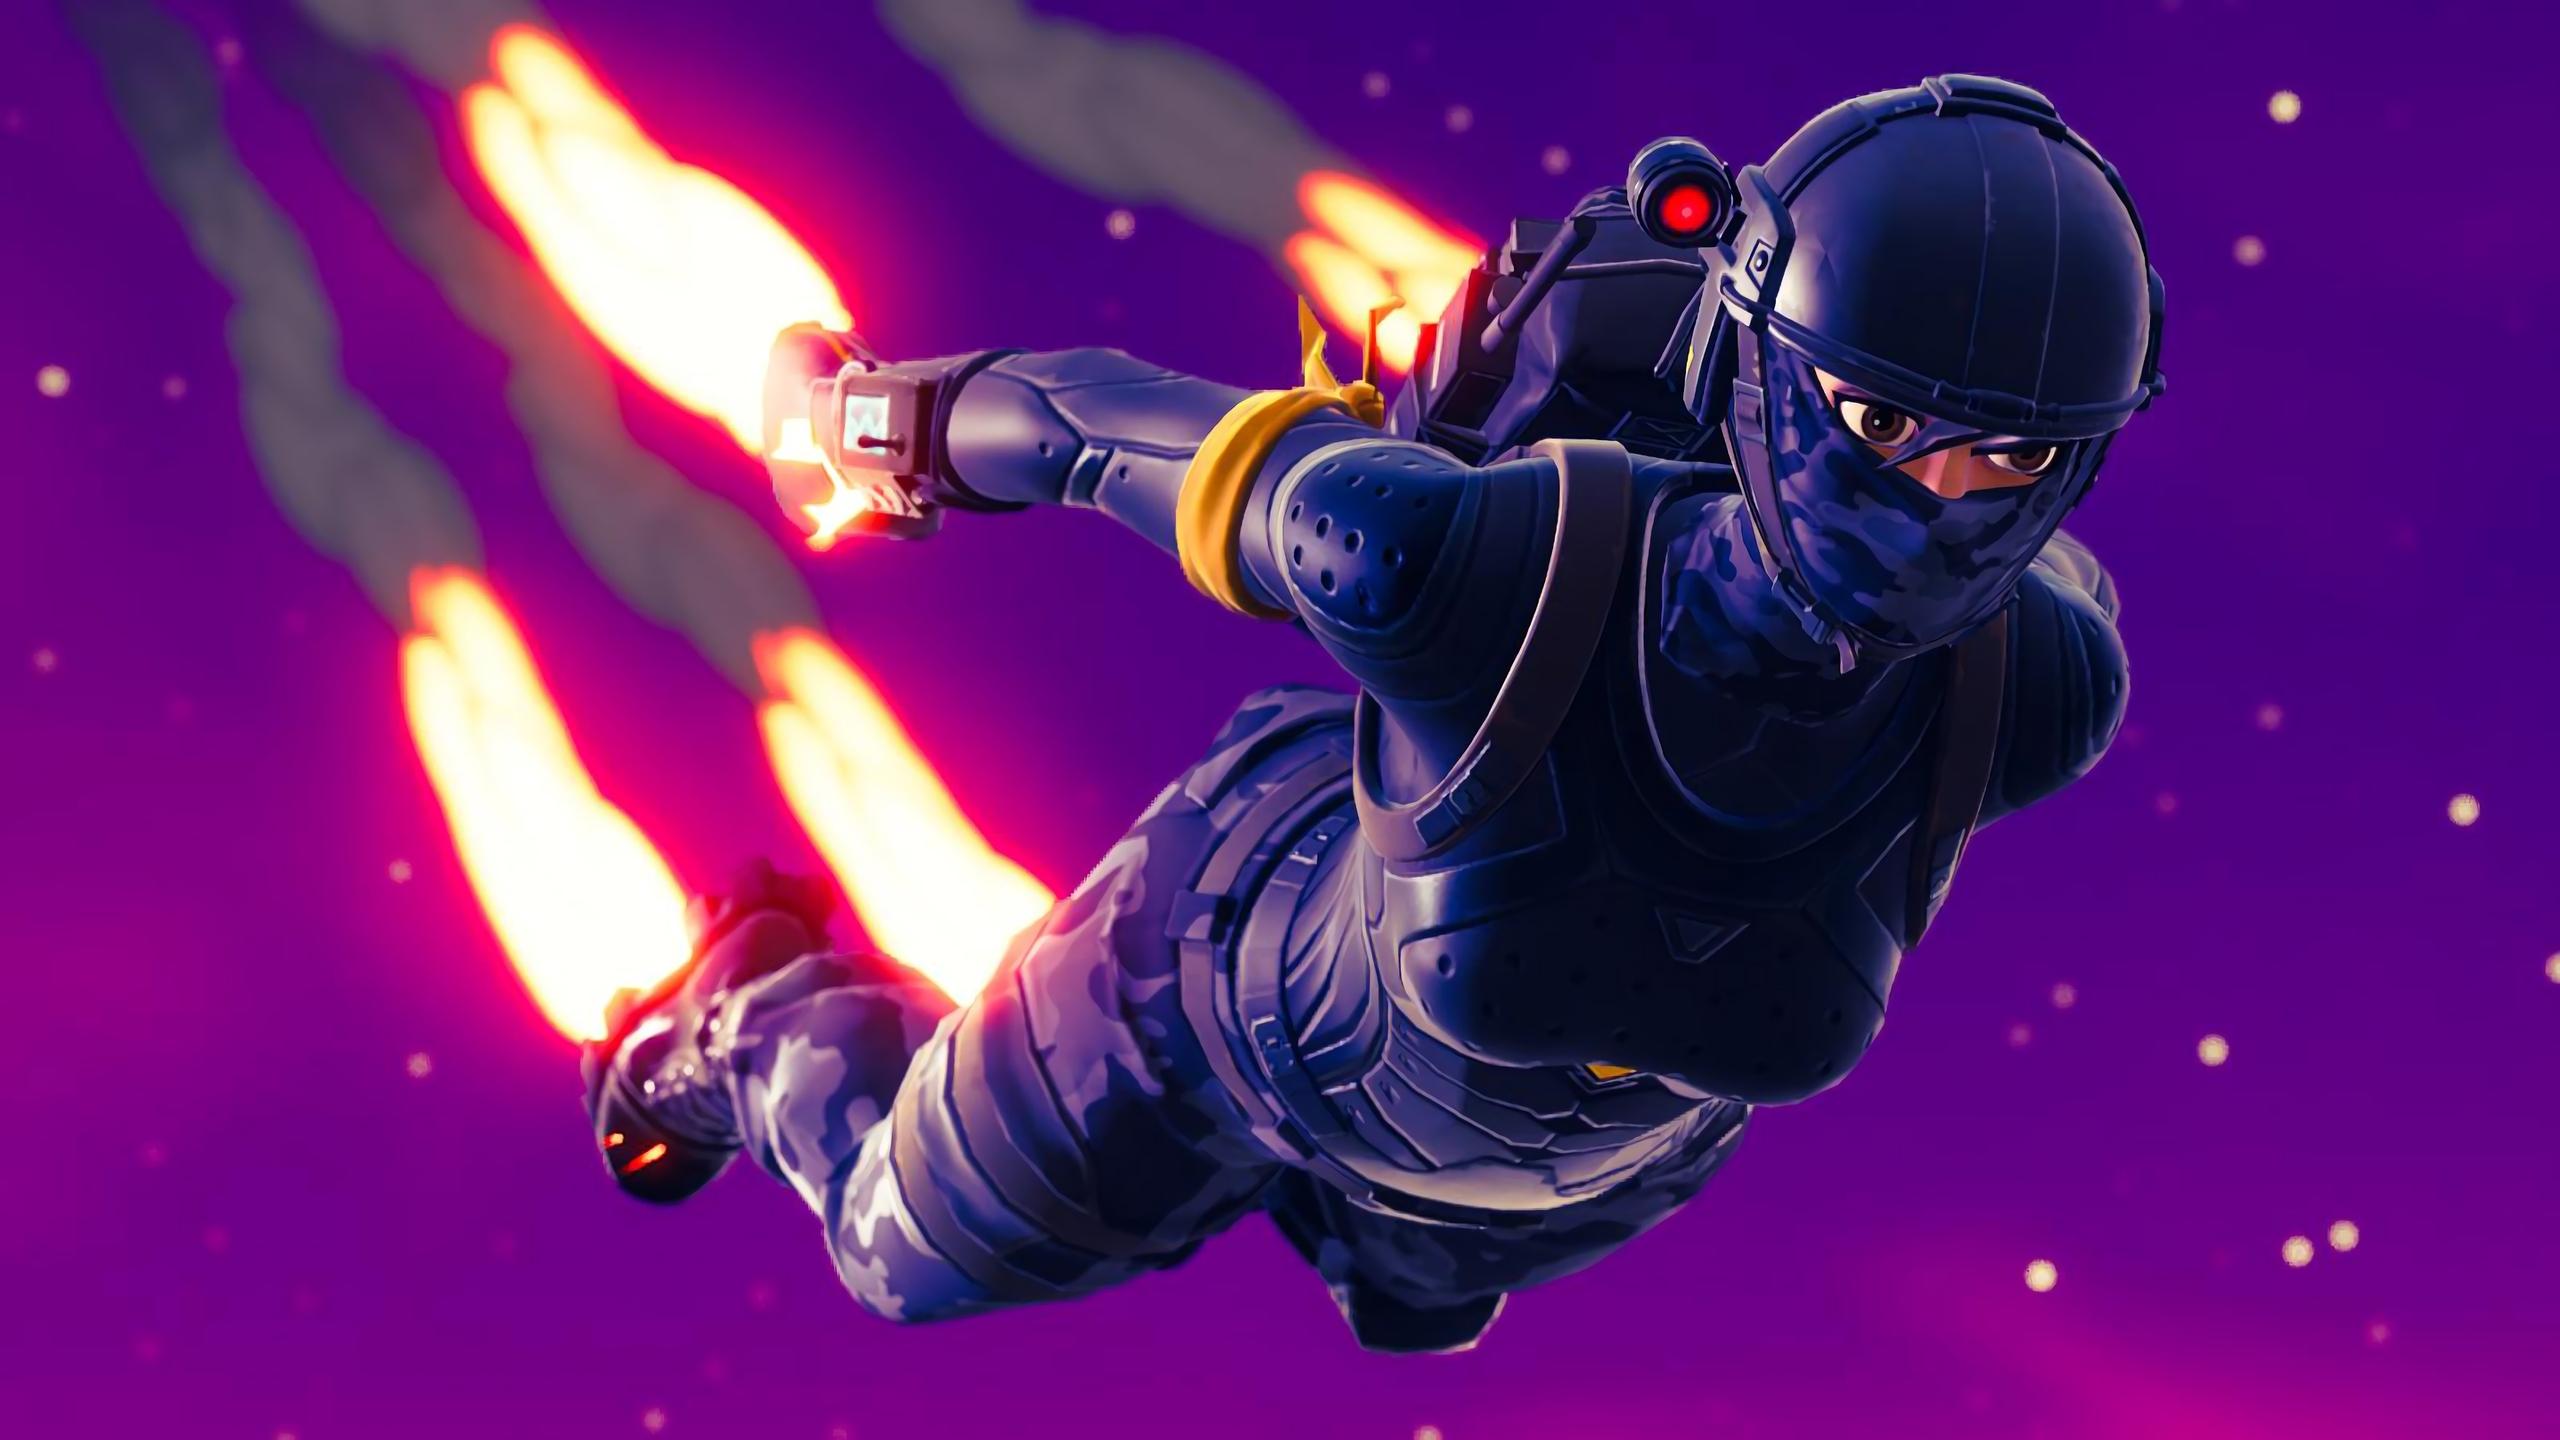 Free Download 2560x1440 Elite Agent Skydive Fortnite Battle